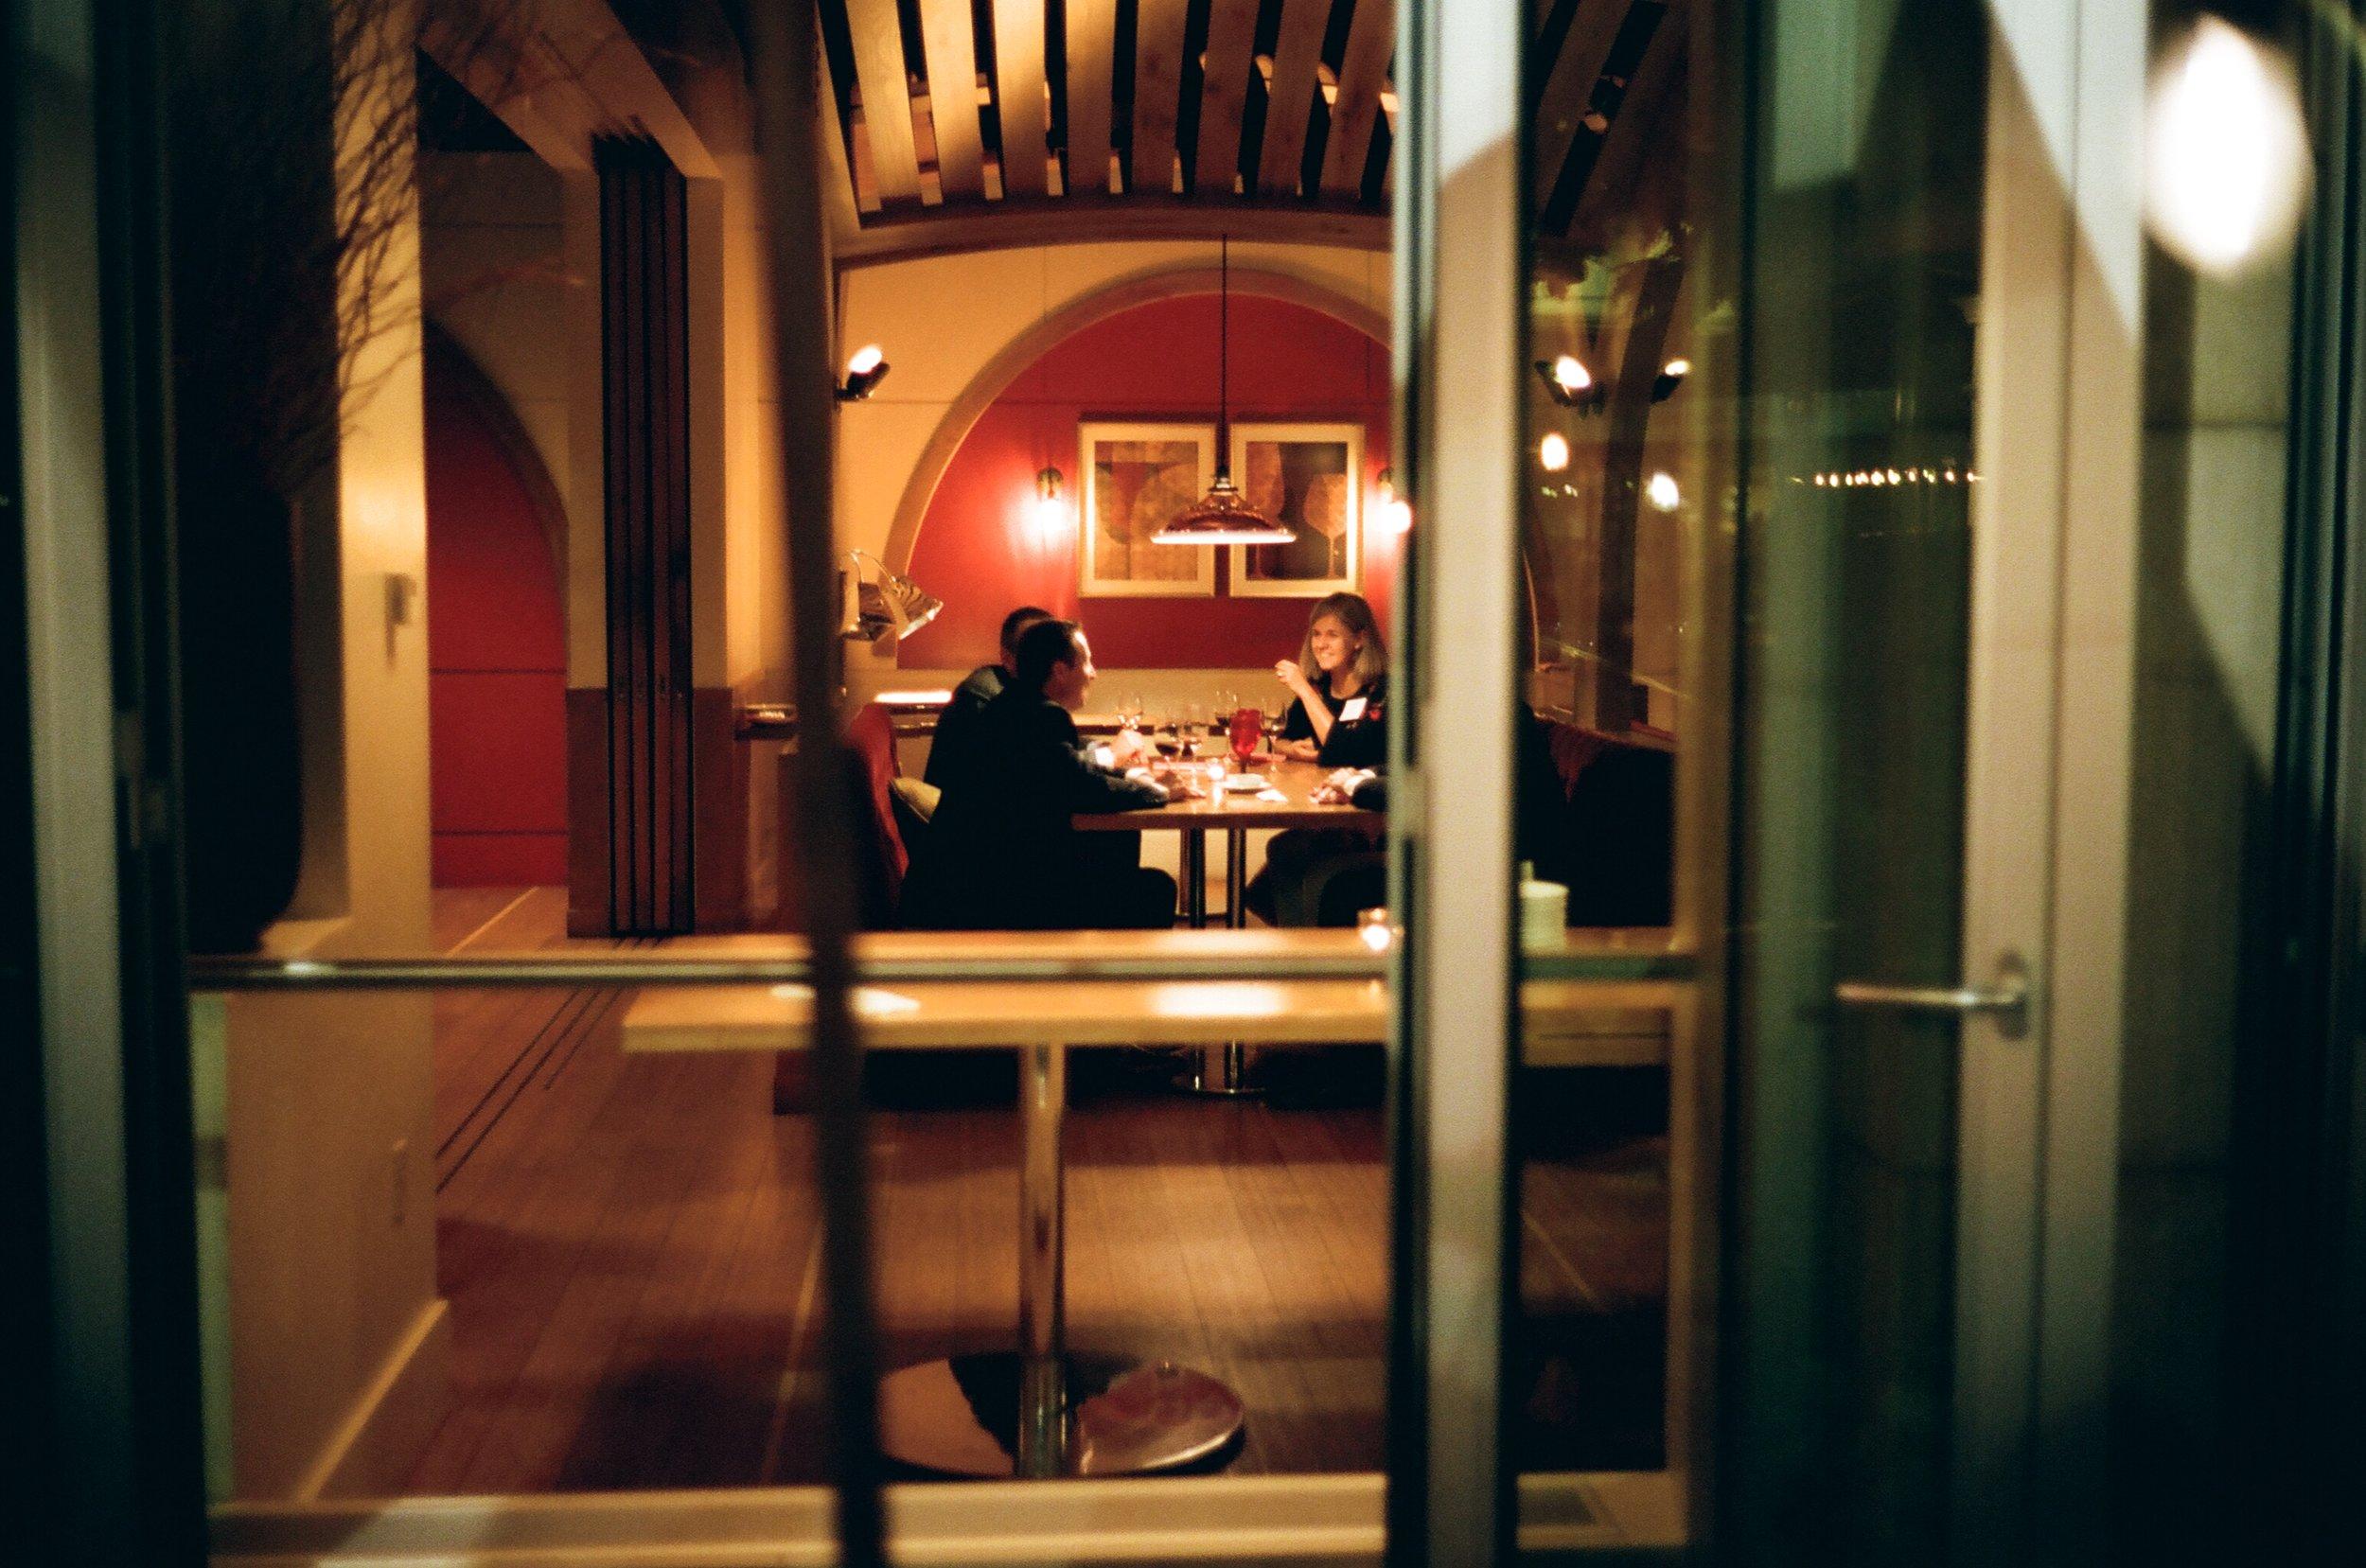 Wine Bar at Midnight   Leica M2 with Kodak Portra 400 Film.